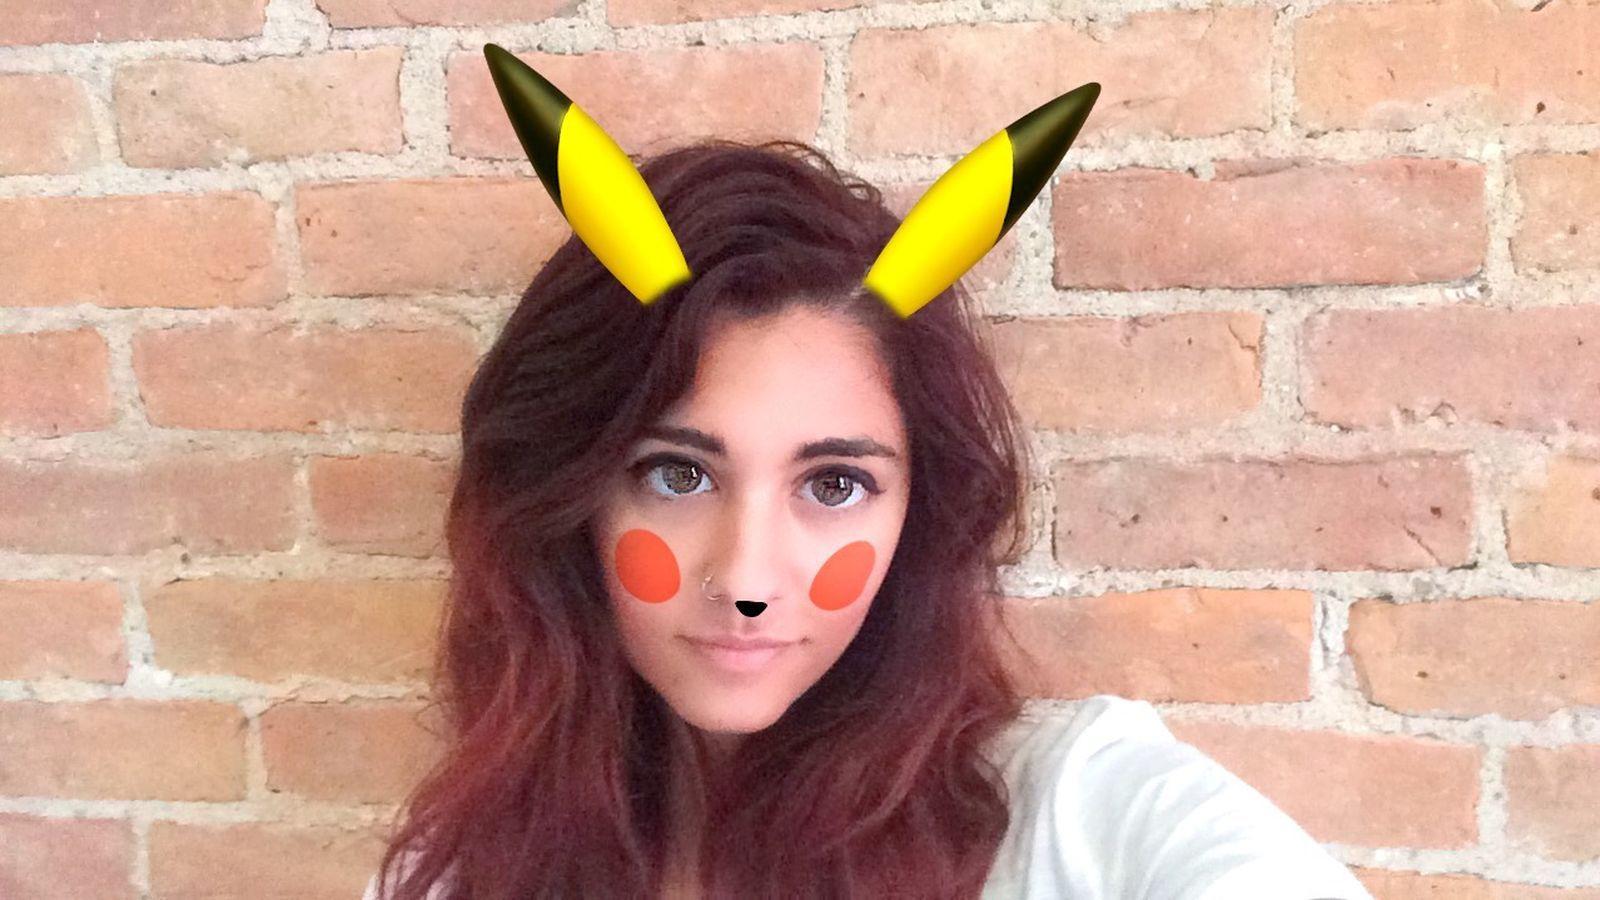 Snapchat adds a Pikachu filter for your kawaii pokémon